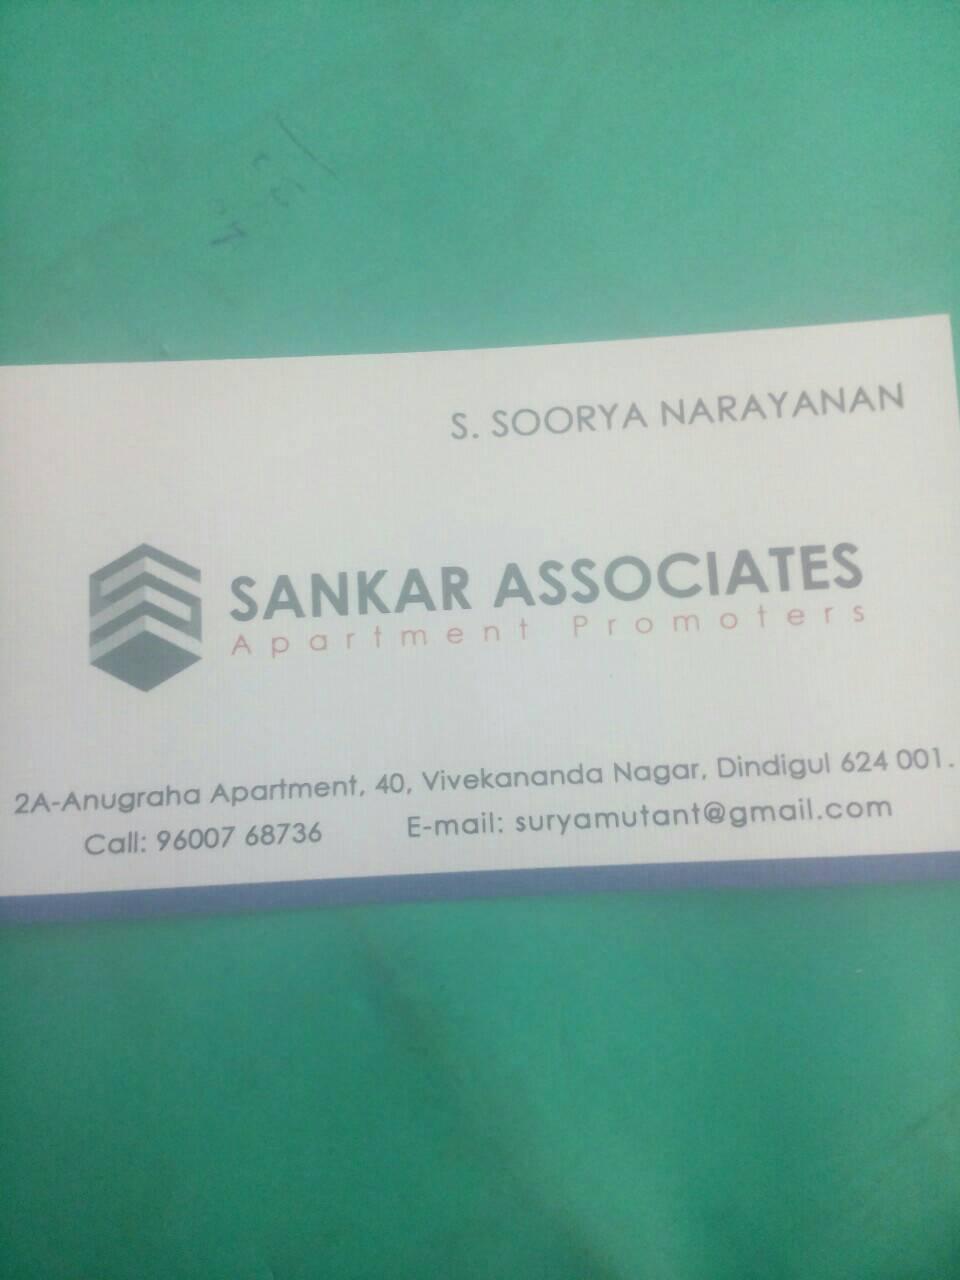 Sankar Associates 9600768736